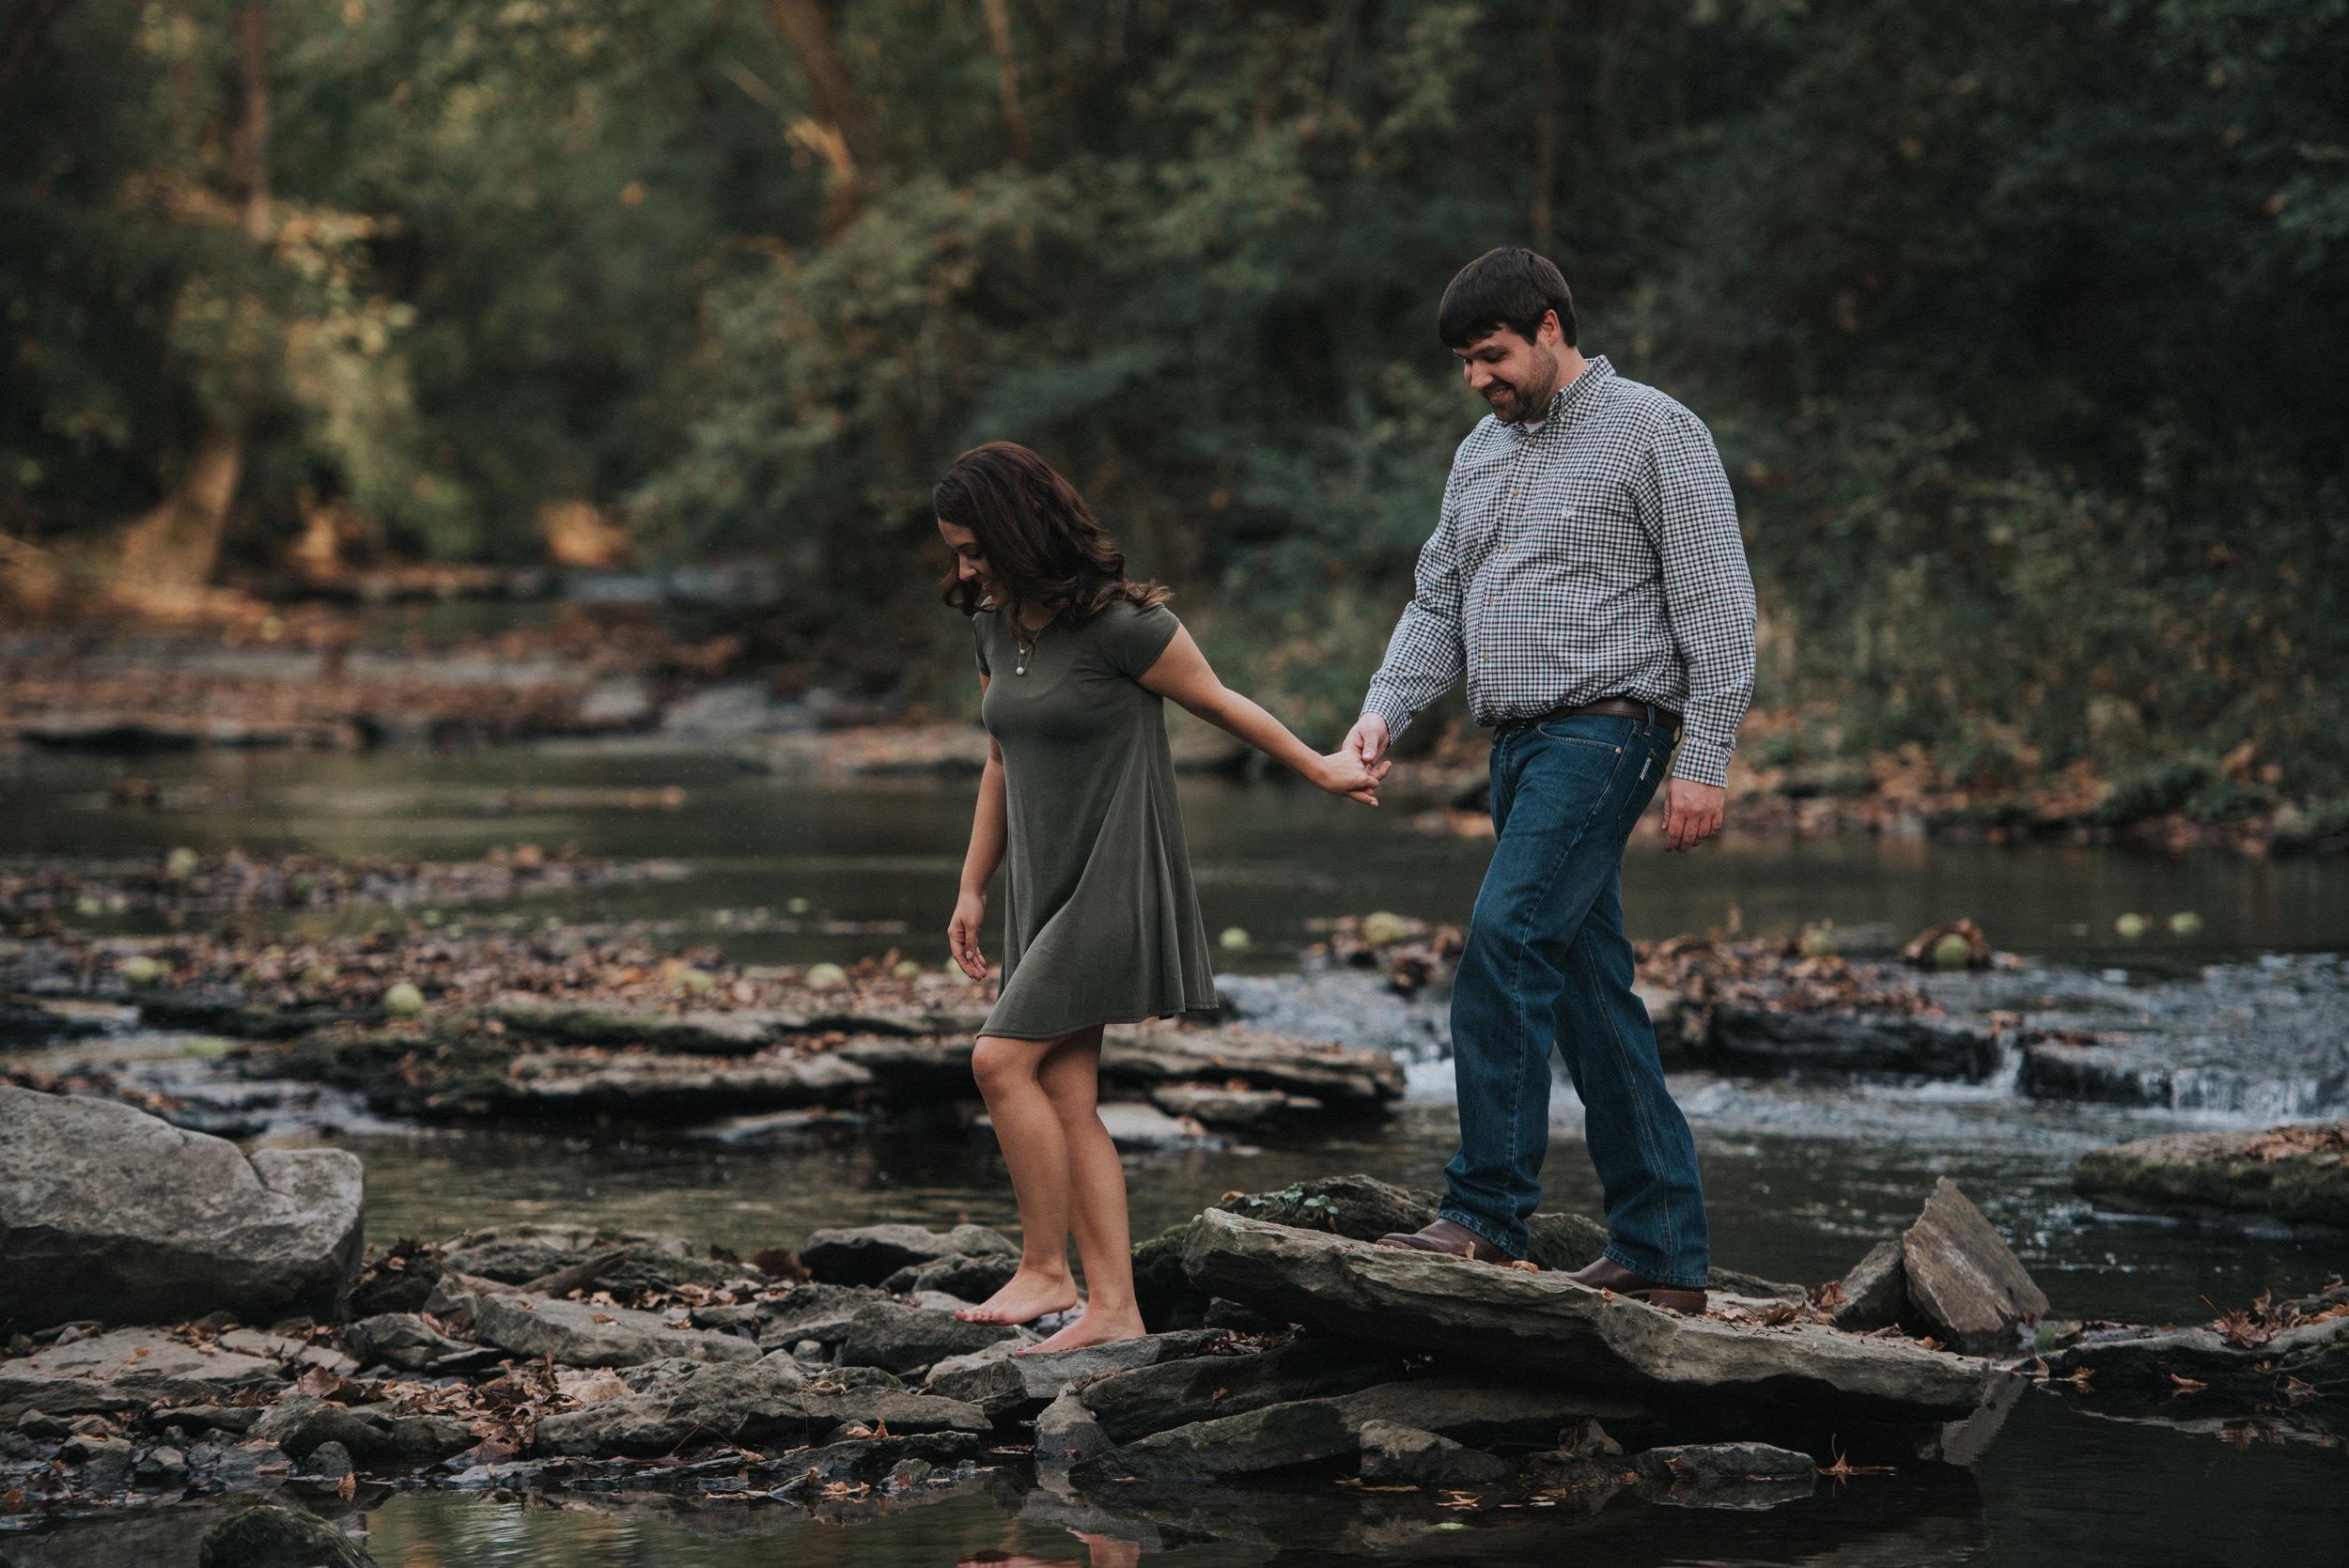 NashvilleWeddingCollection-46.jpg